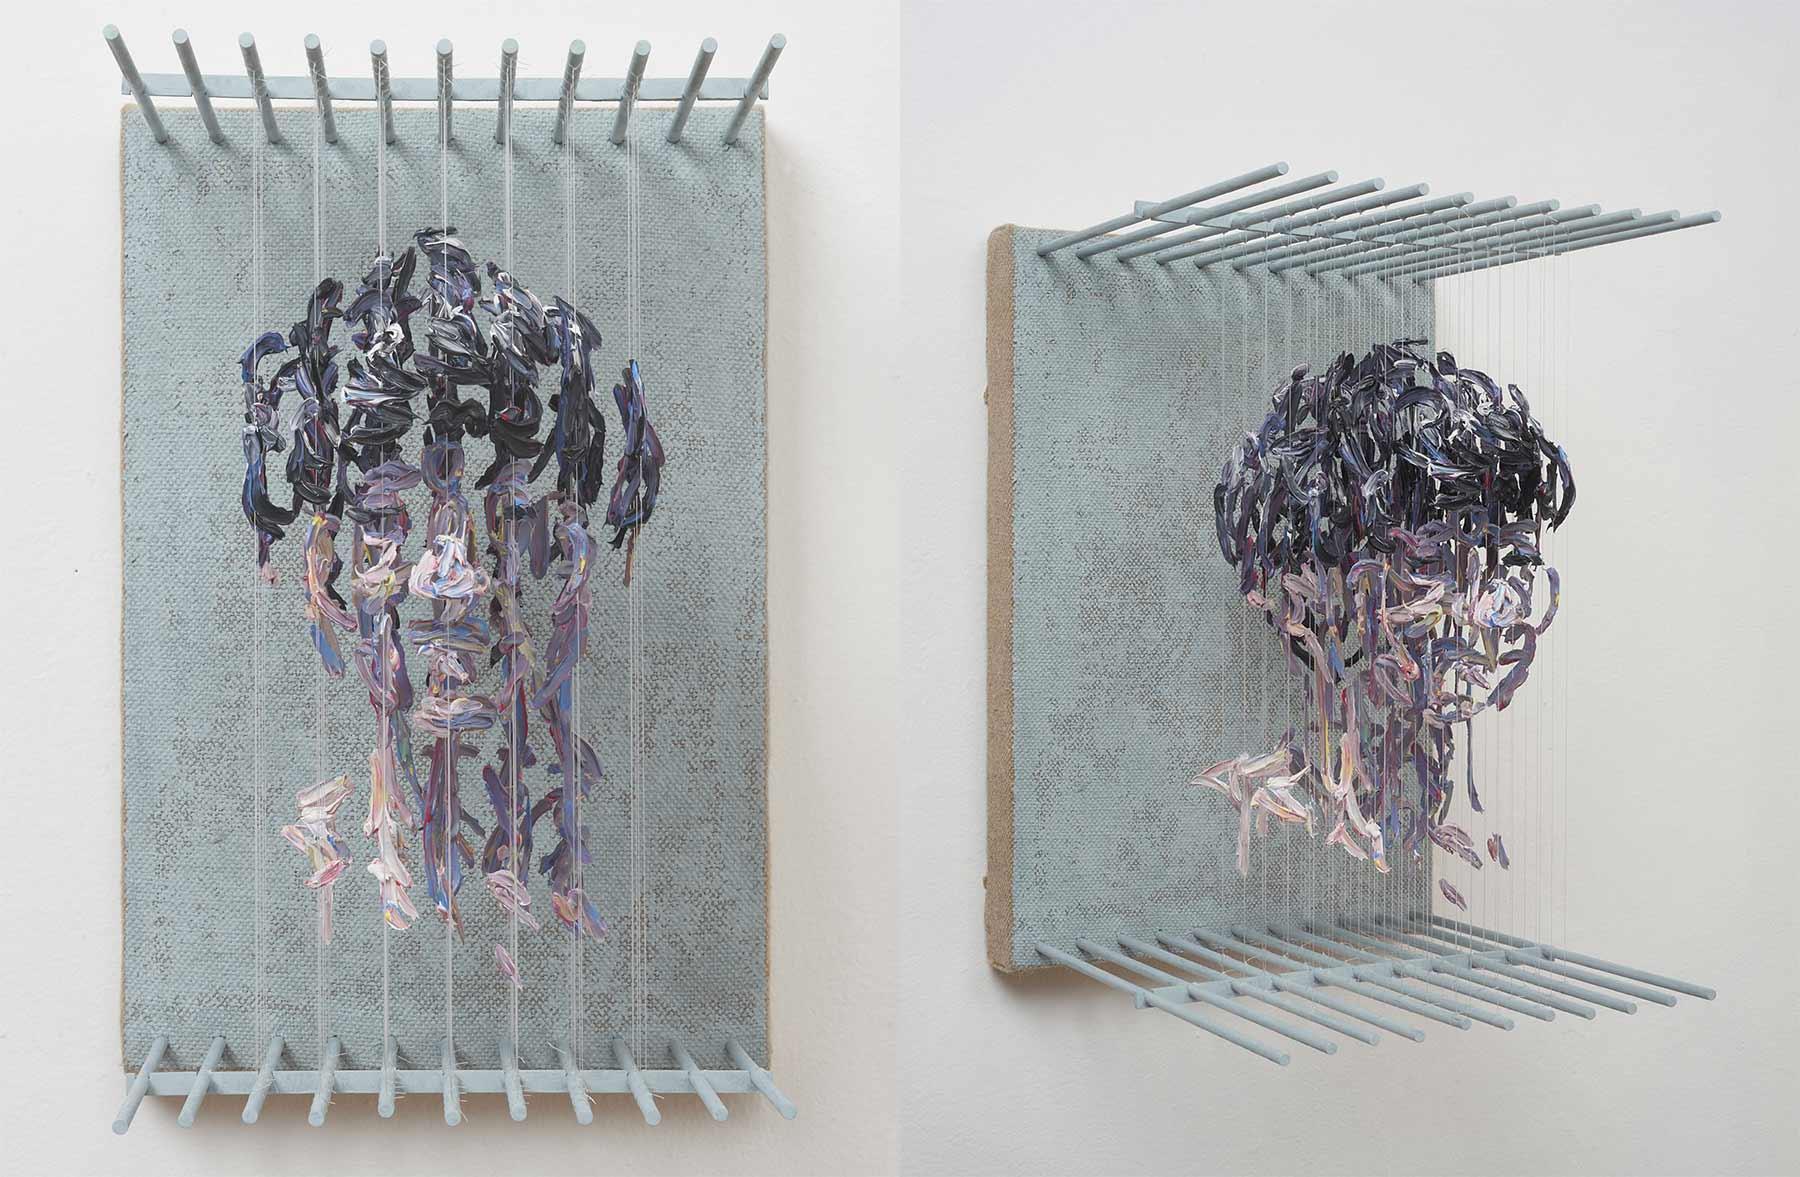 3D-Portraits aus abgehangenen Pinselstrichen